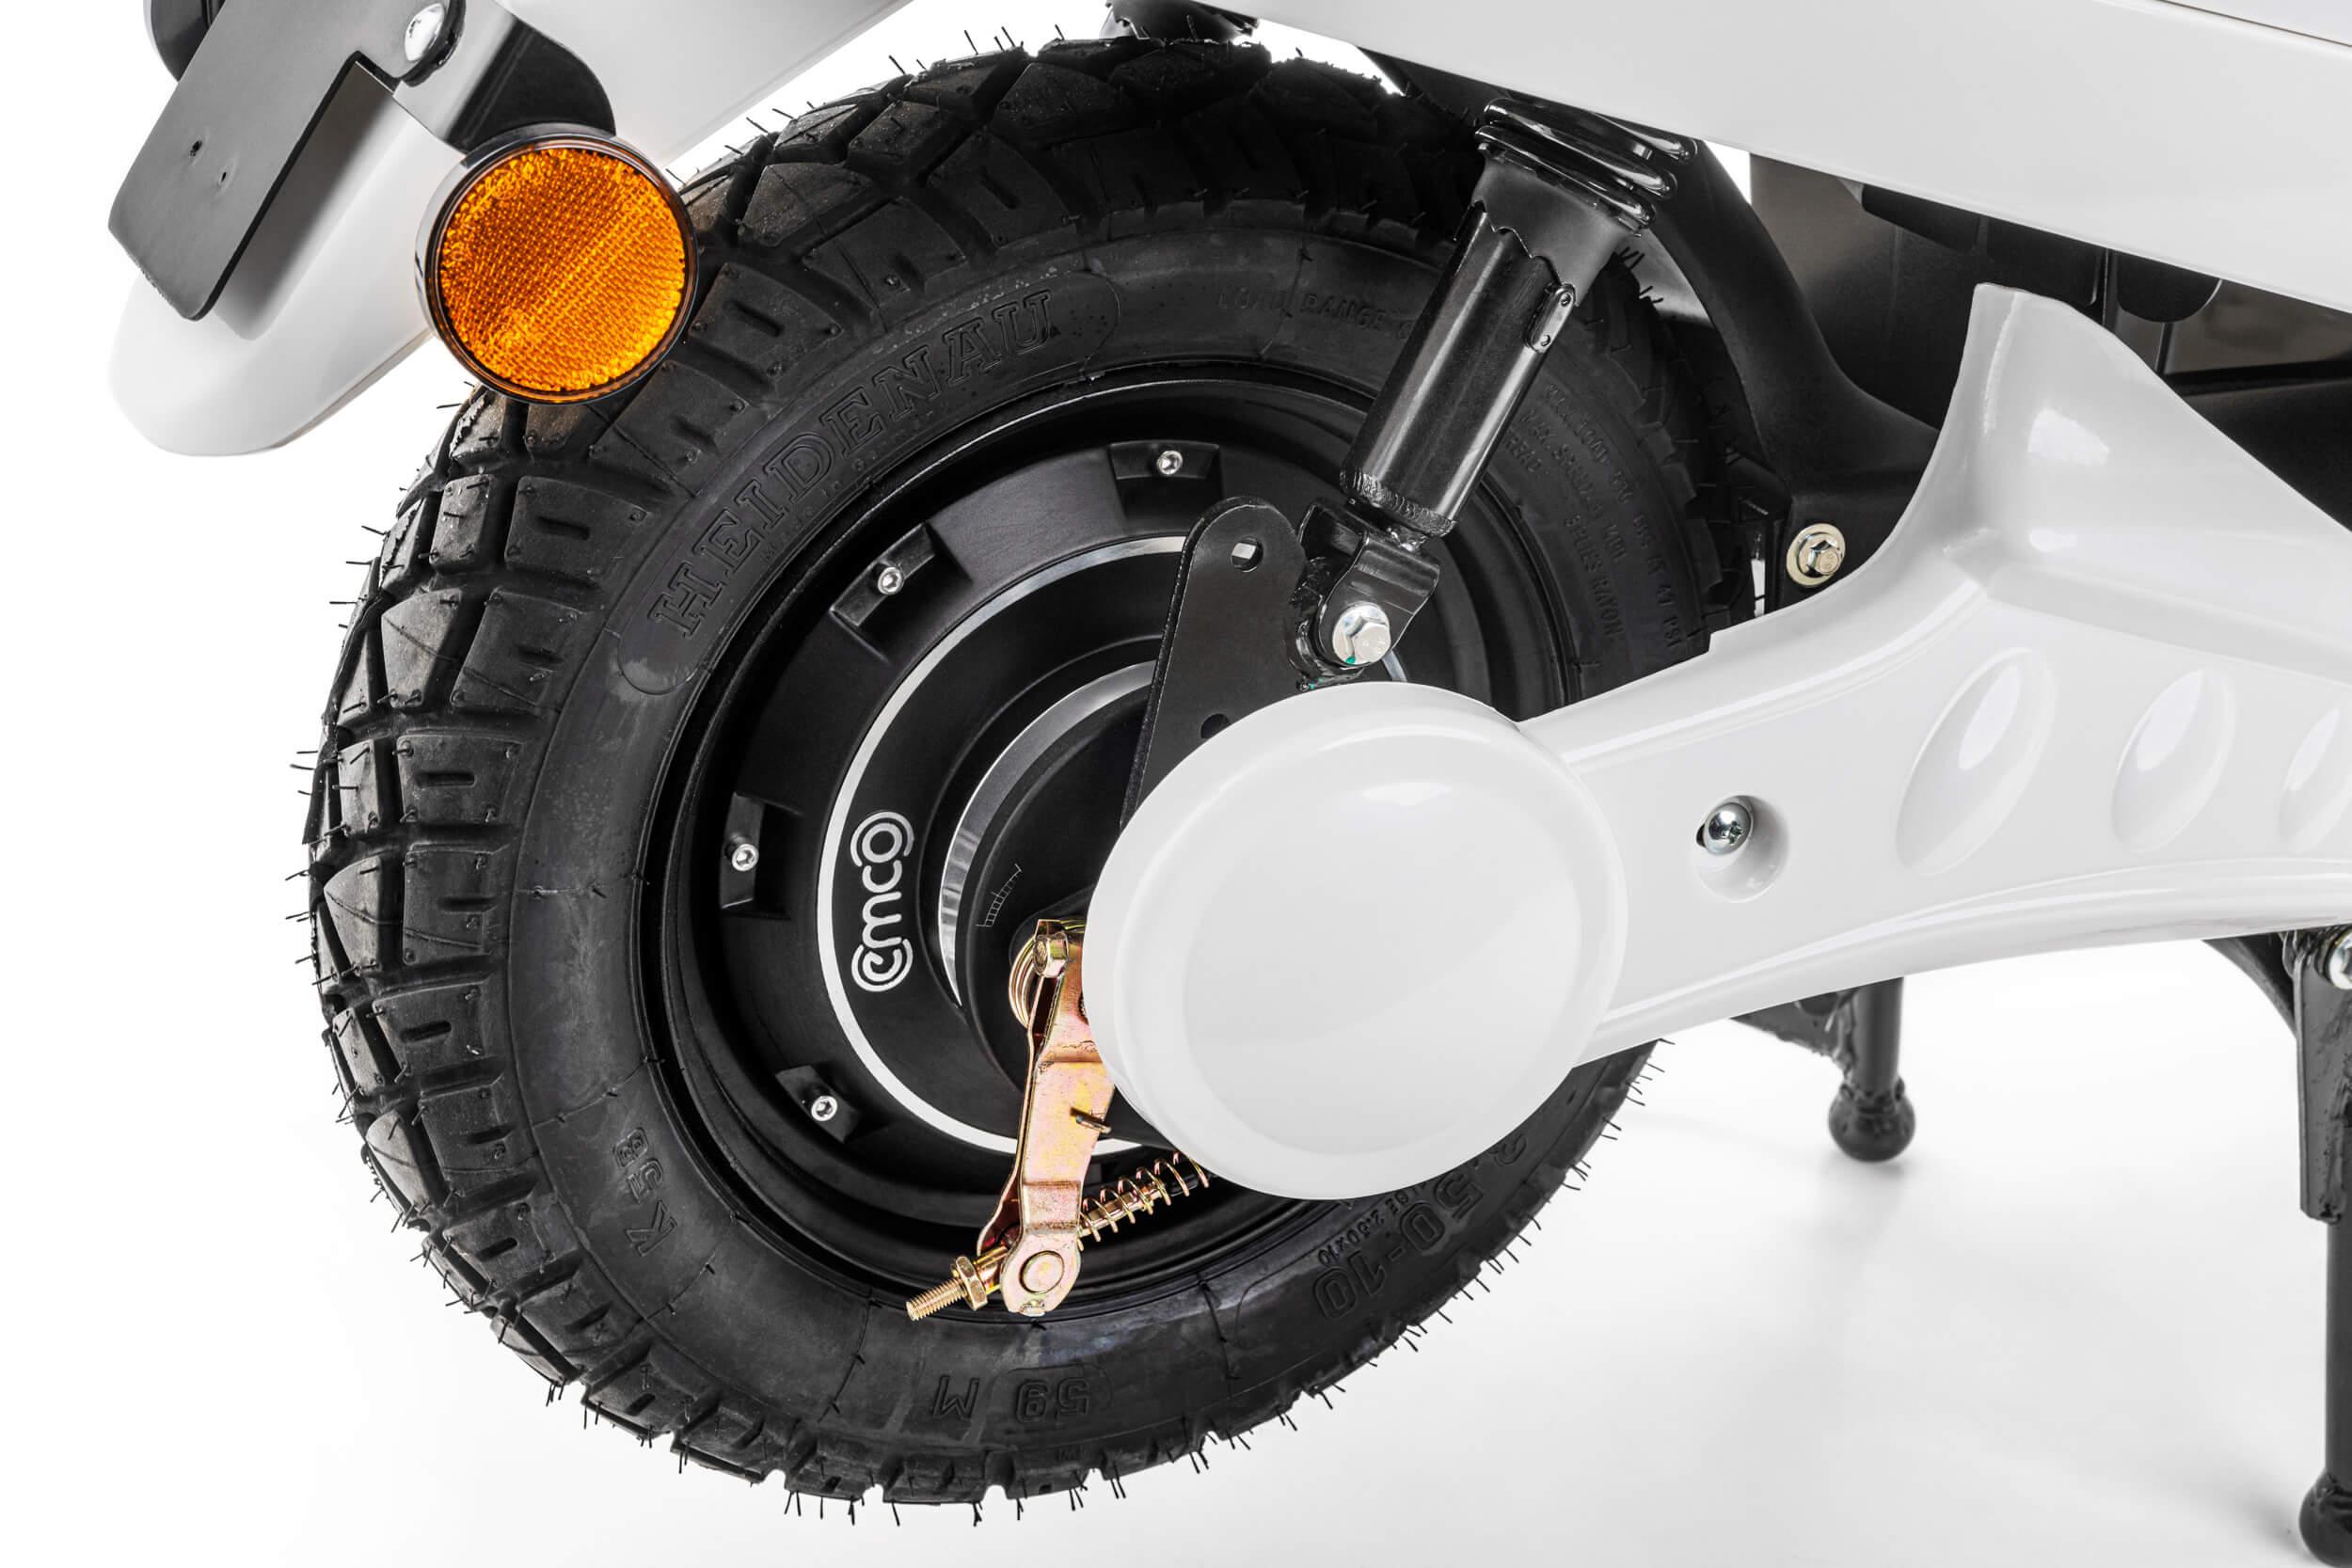 elektroroller-e-scooter-novantic-hinterrad